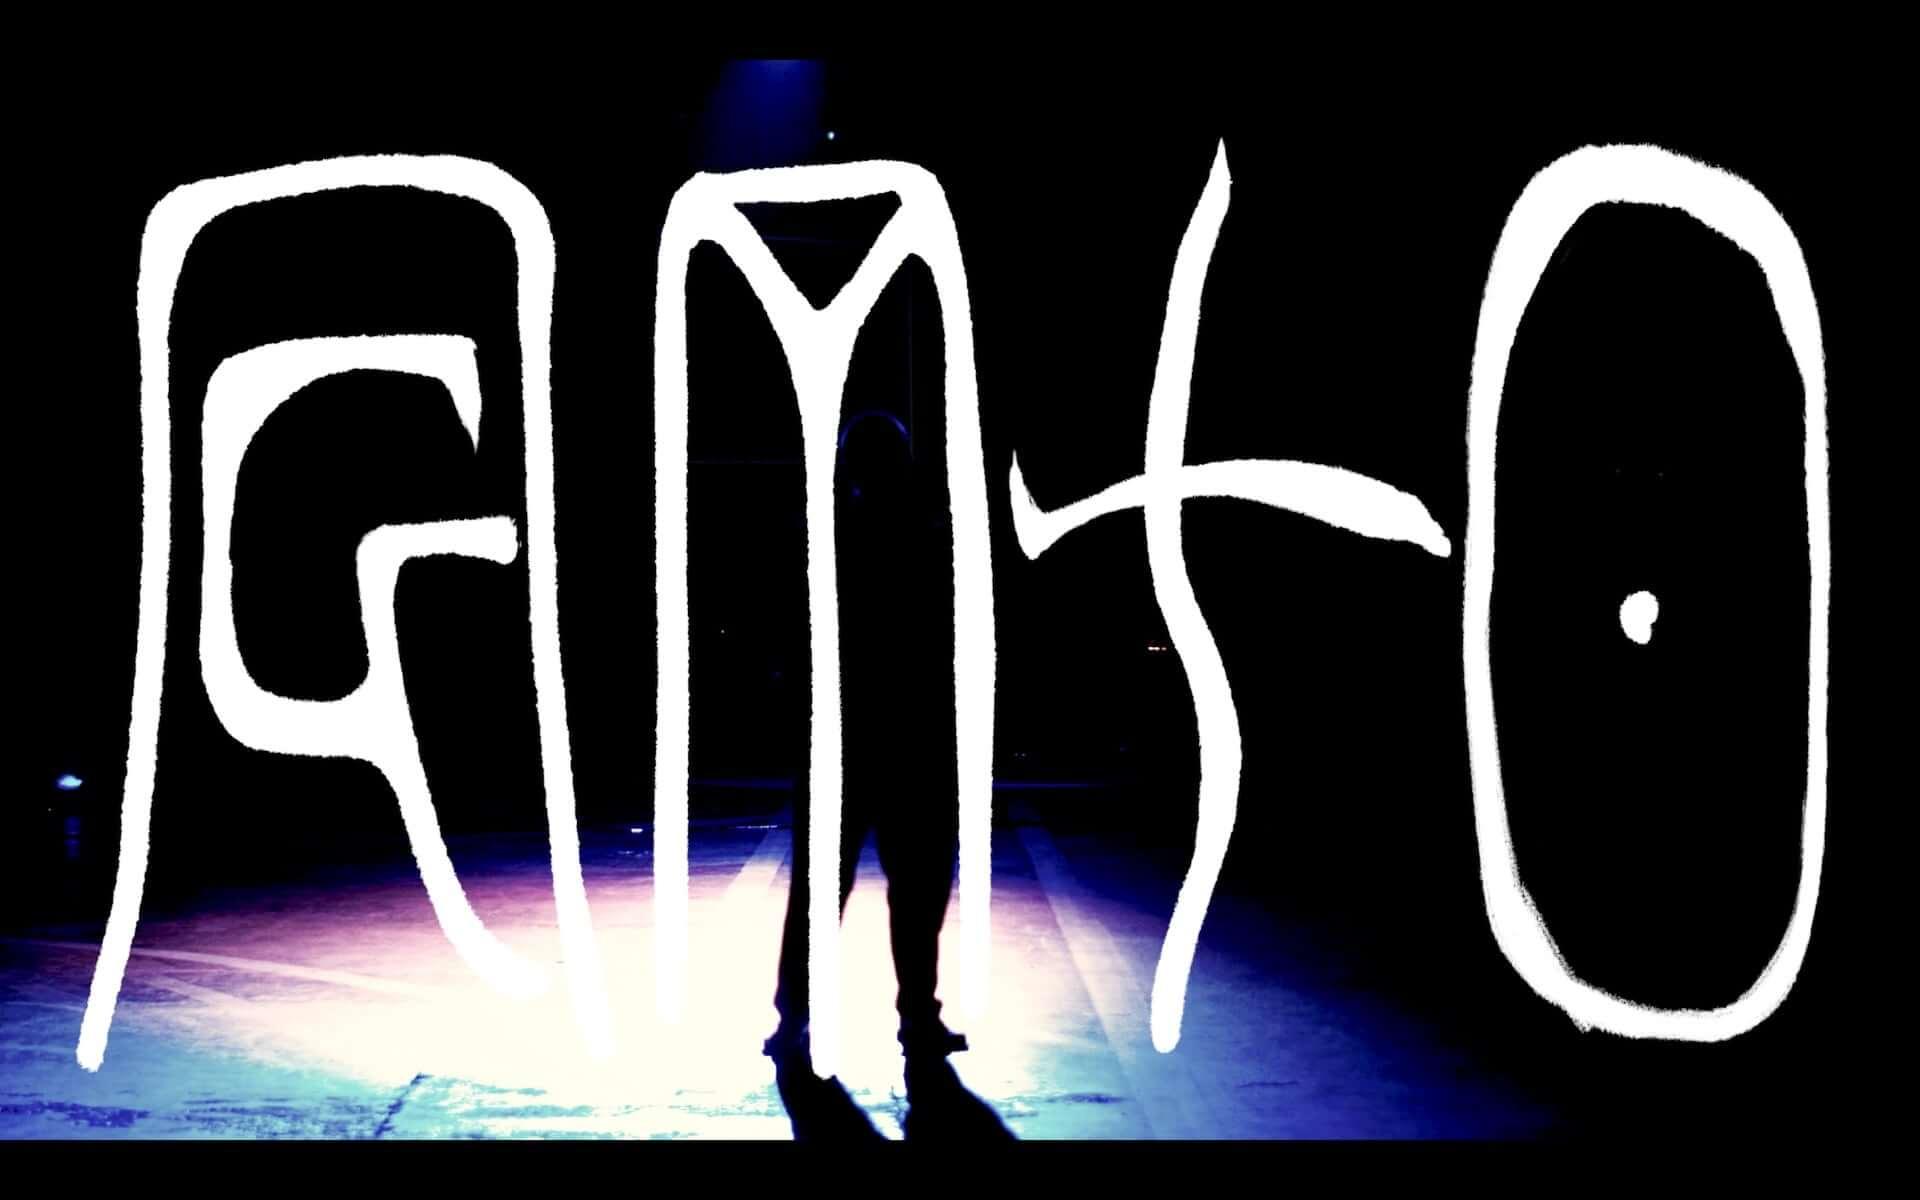 "gatoの1stアルバム『BAECUL』と""miss u""MV、最新アー写が本日解禁!渋谷WWWでのリリパにはNo Busesが出演決定 music201014_gato_6-1920x1200"